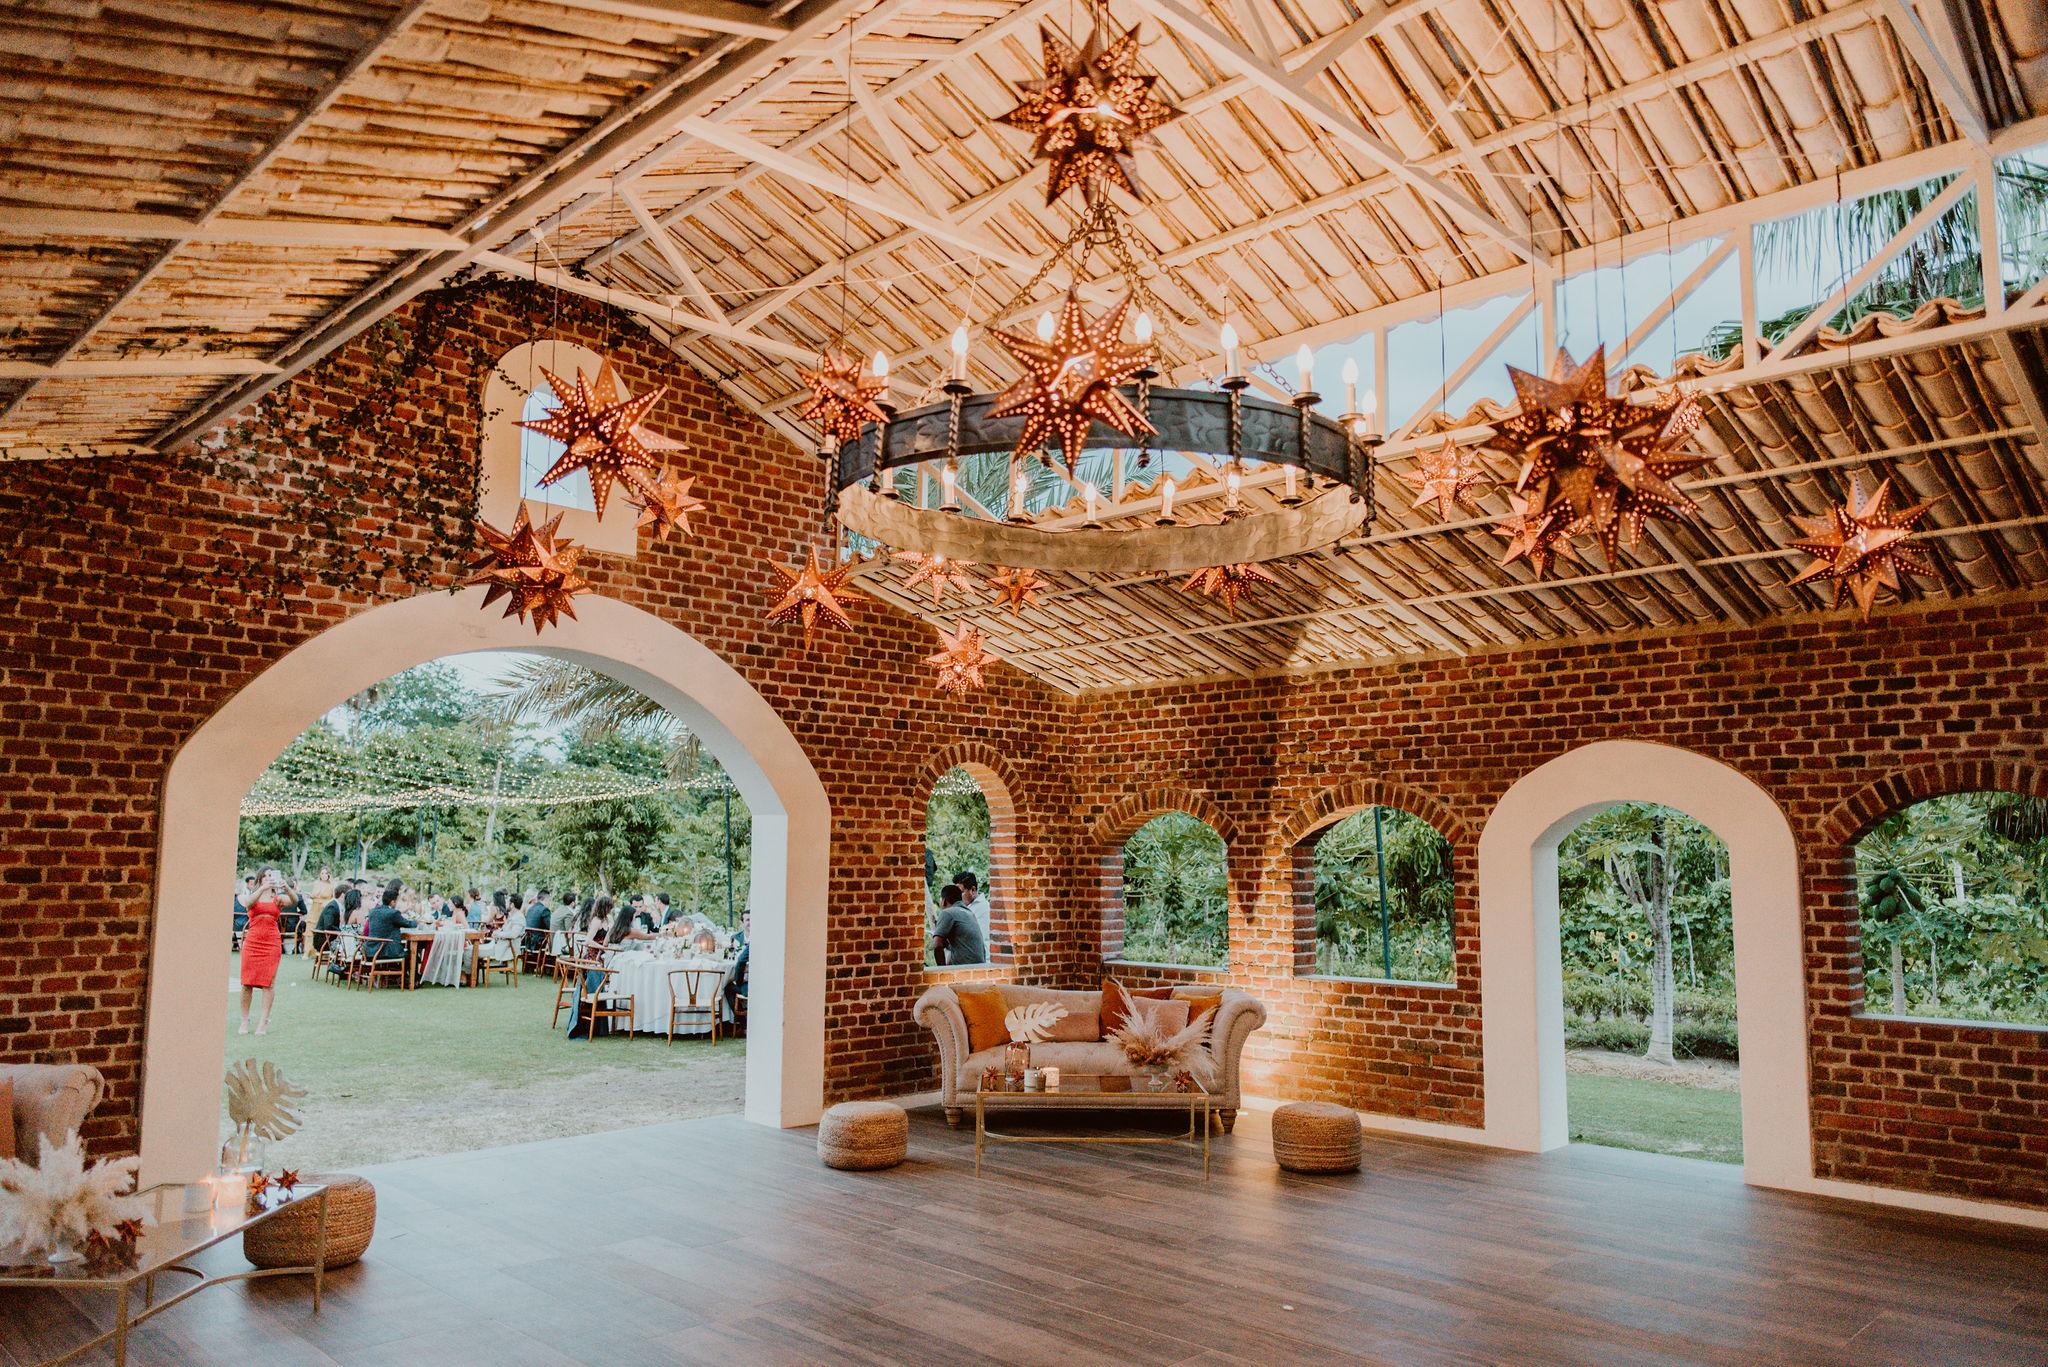 Flora Farms A Charming Wedding Venue Farm In Cabo Vivid Occasions Vivid Occasions